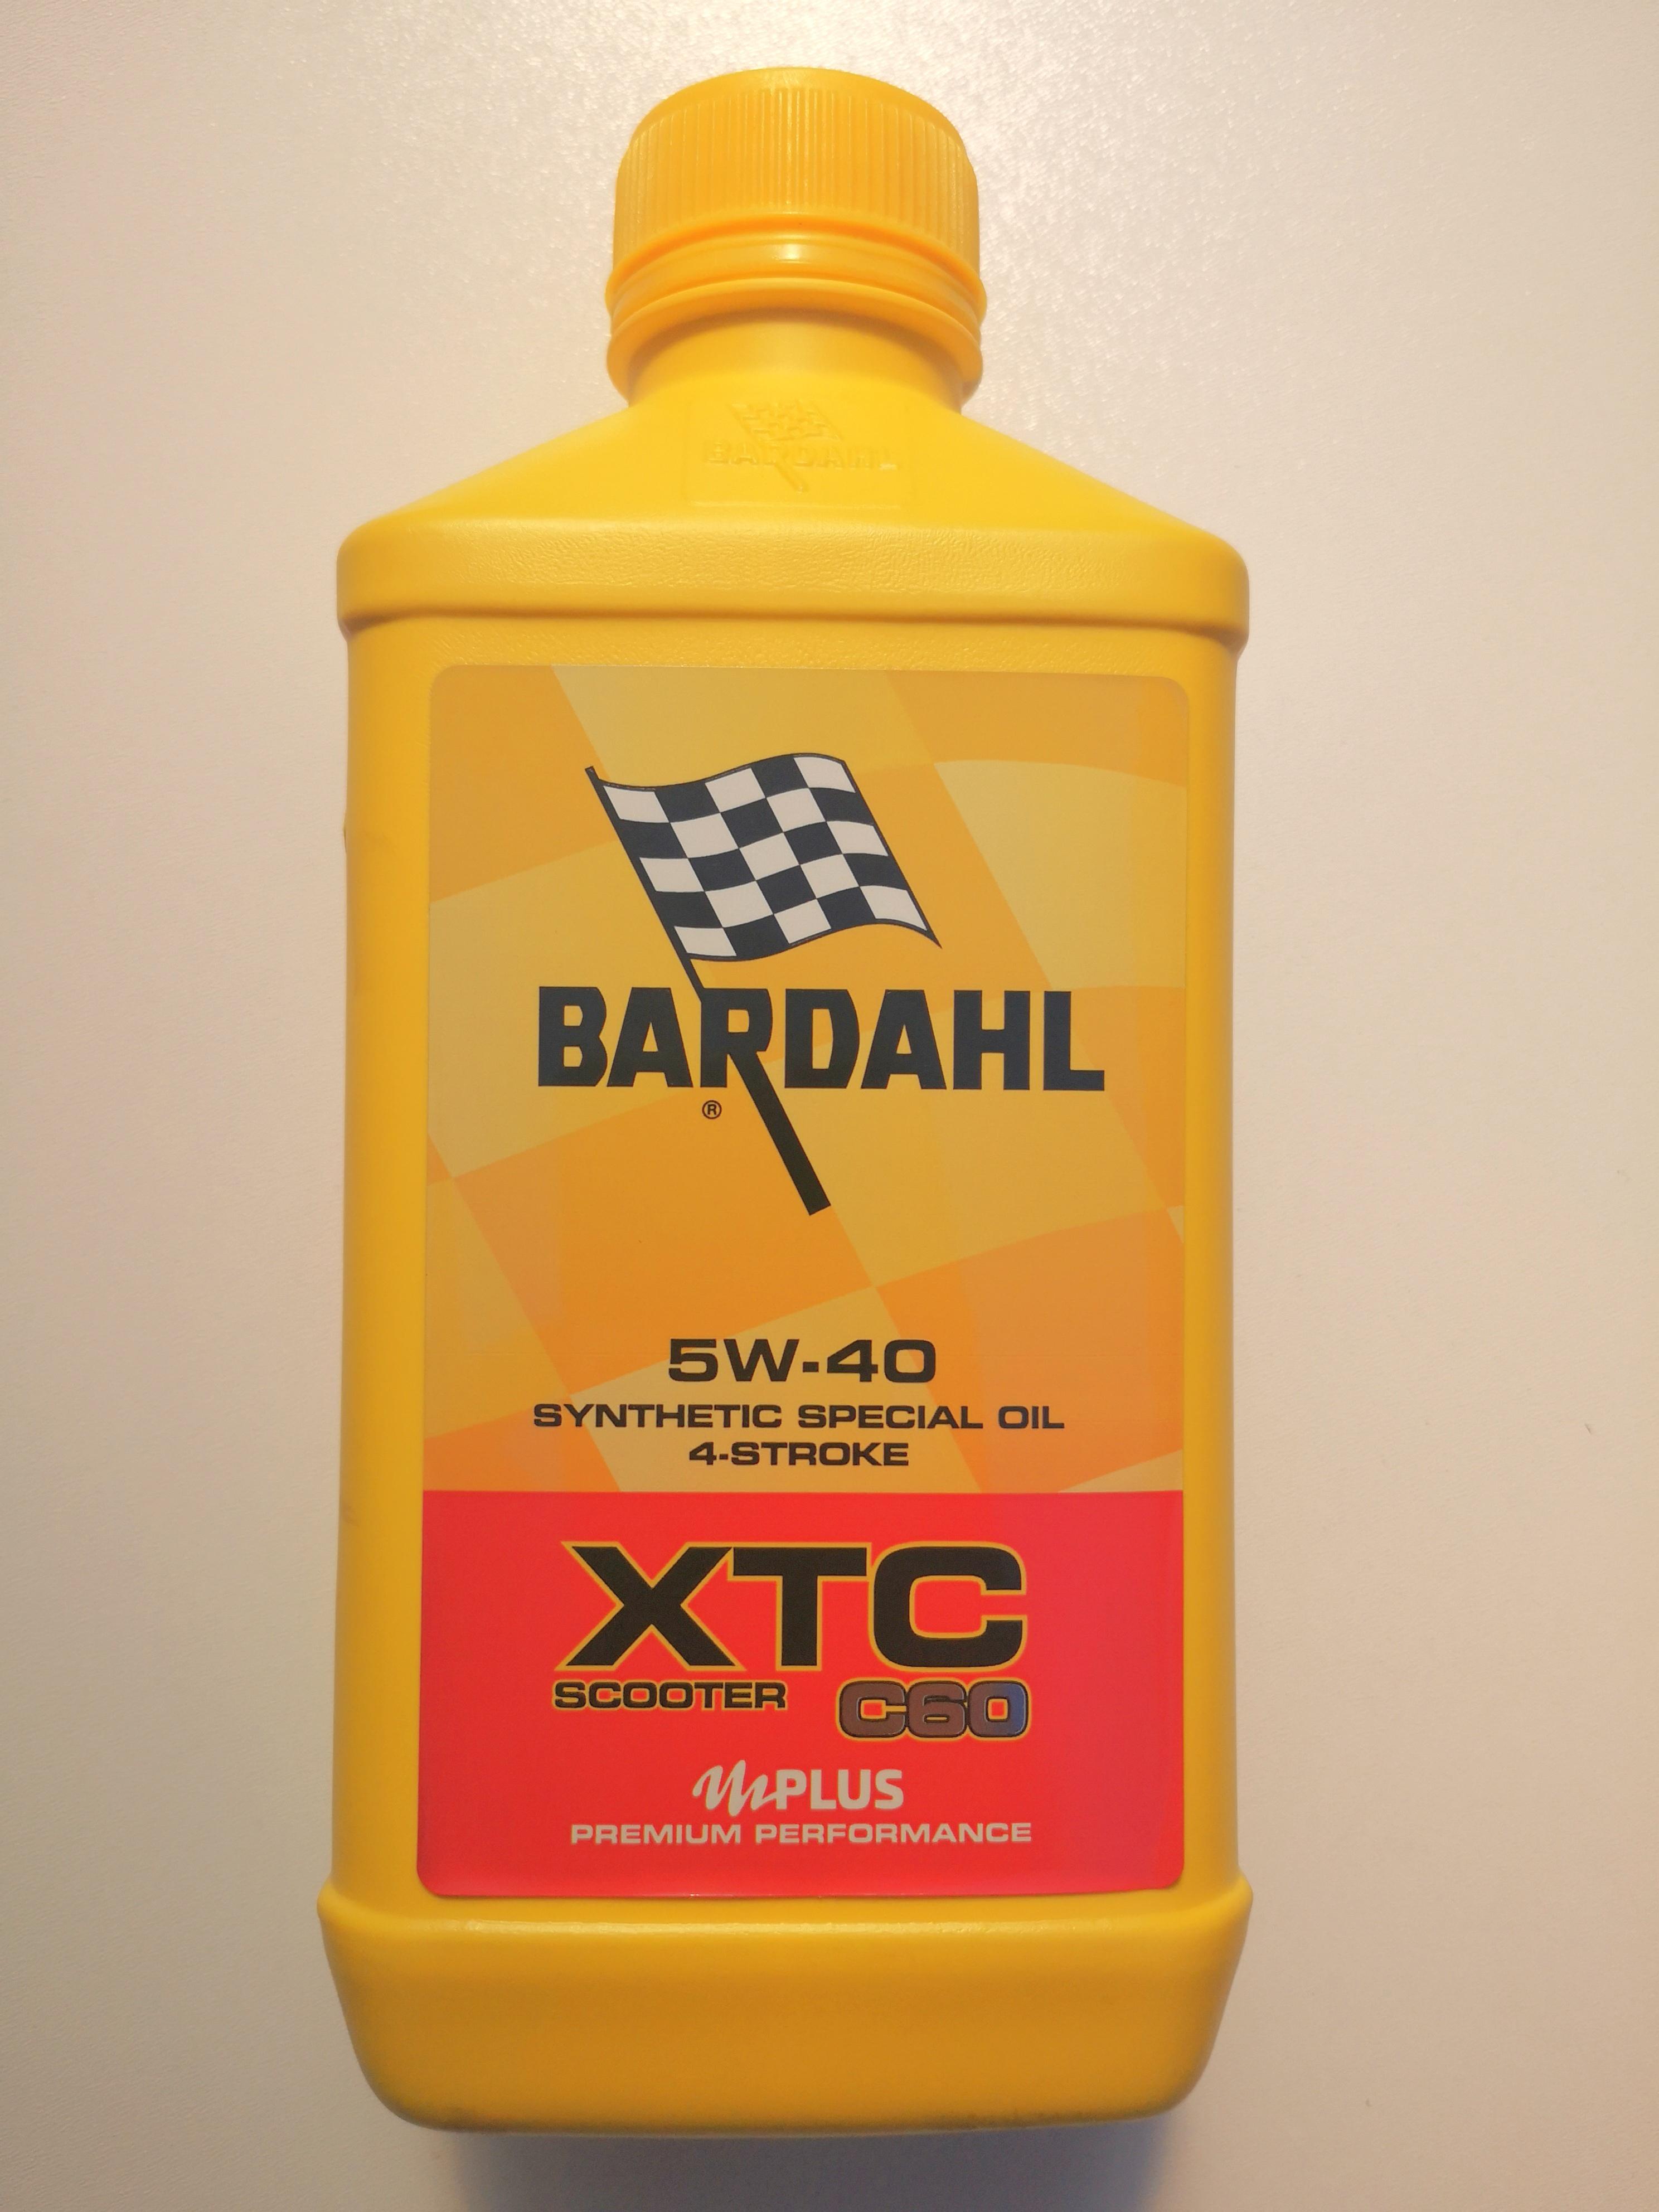 OLIO MOTORE BARDAHL XTC C60 per MOTO e SCOOTER 4 TEMPI SAE 5W40 - MOTOFORNITURE GF